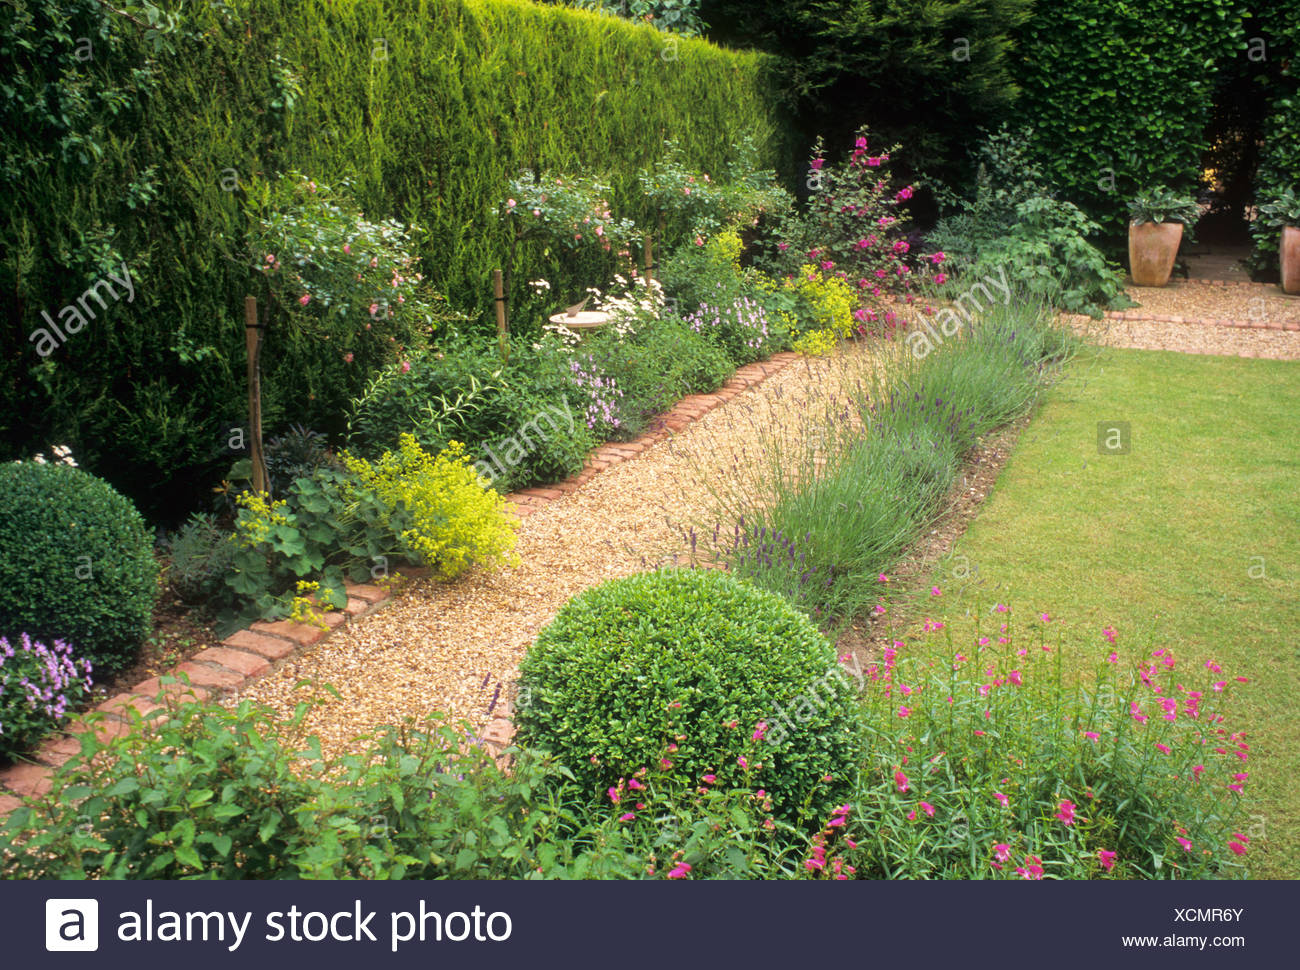 Gravel Brick Path Border Evergreen Leylandii Hedge Lawn Small Garden Design Small Back Garden Planters Stock Photo Alamy